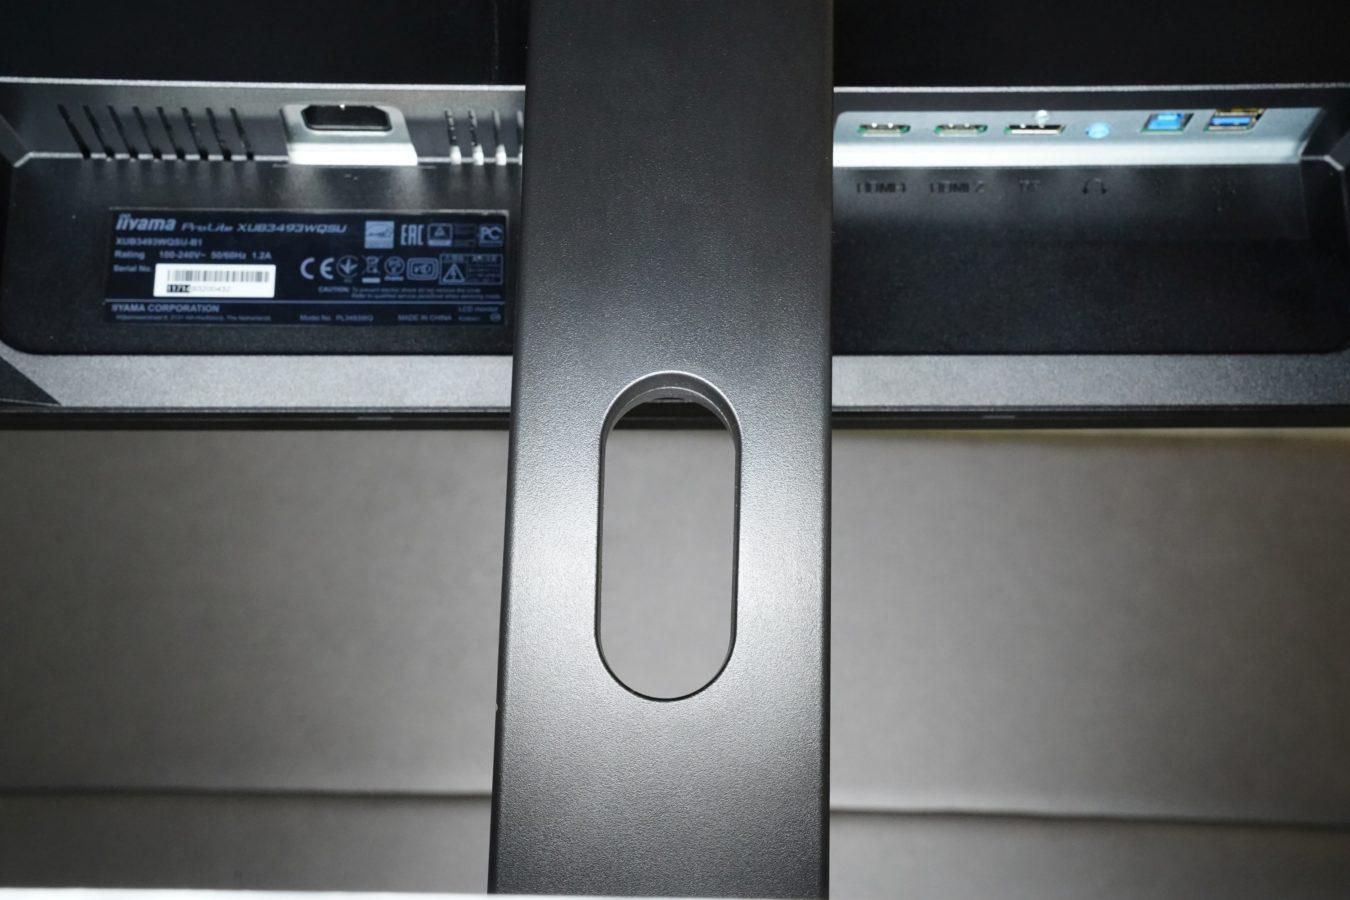 Recenzja iiyama ProLite XUB3493WQSU - drogi, ale fajny monitor! 25 iiyama ProLite XUB3493WQSU